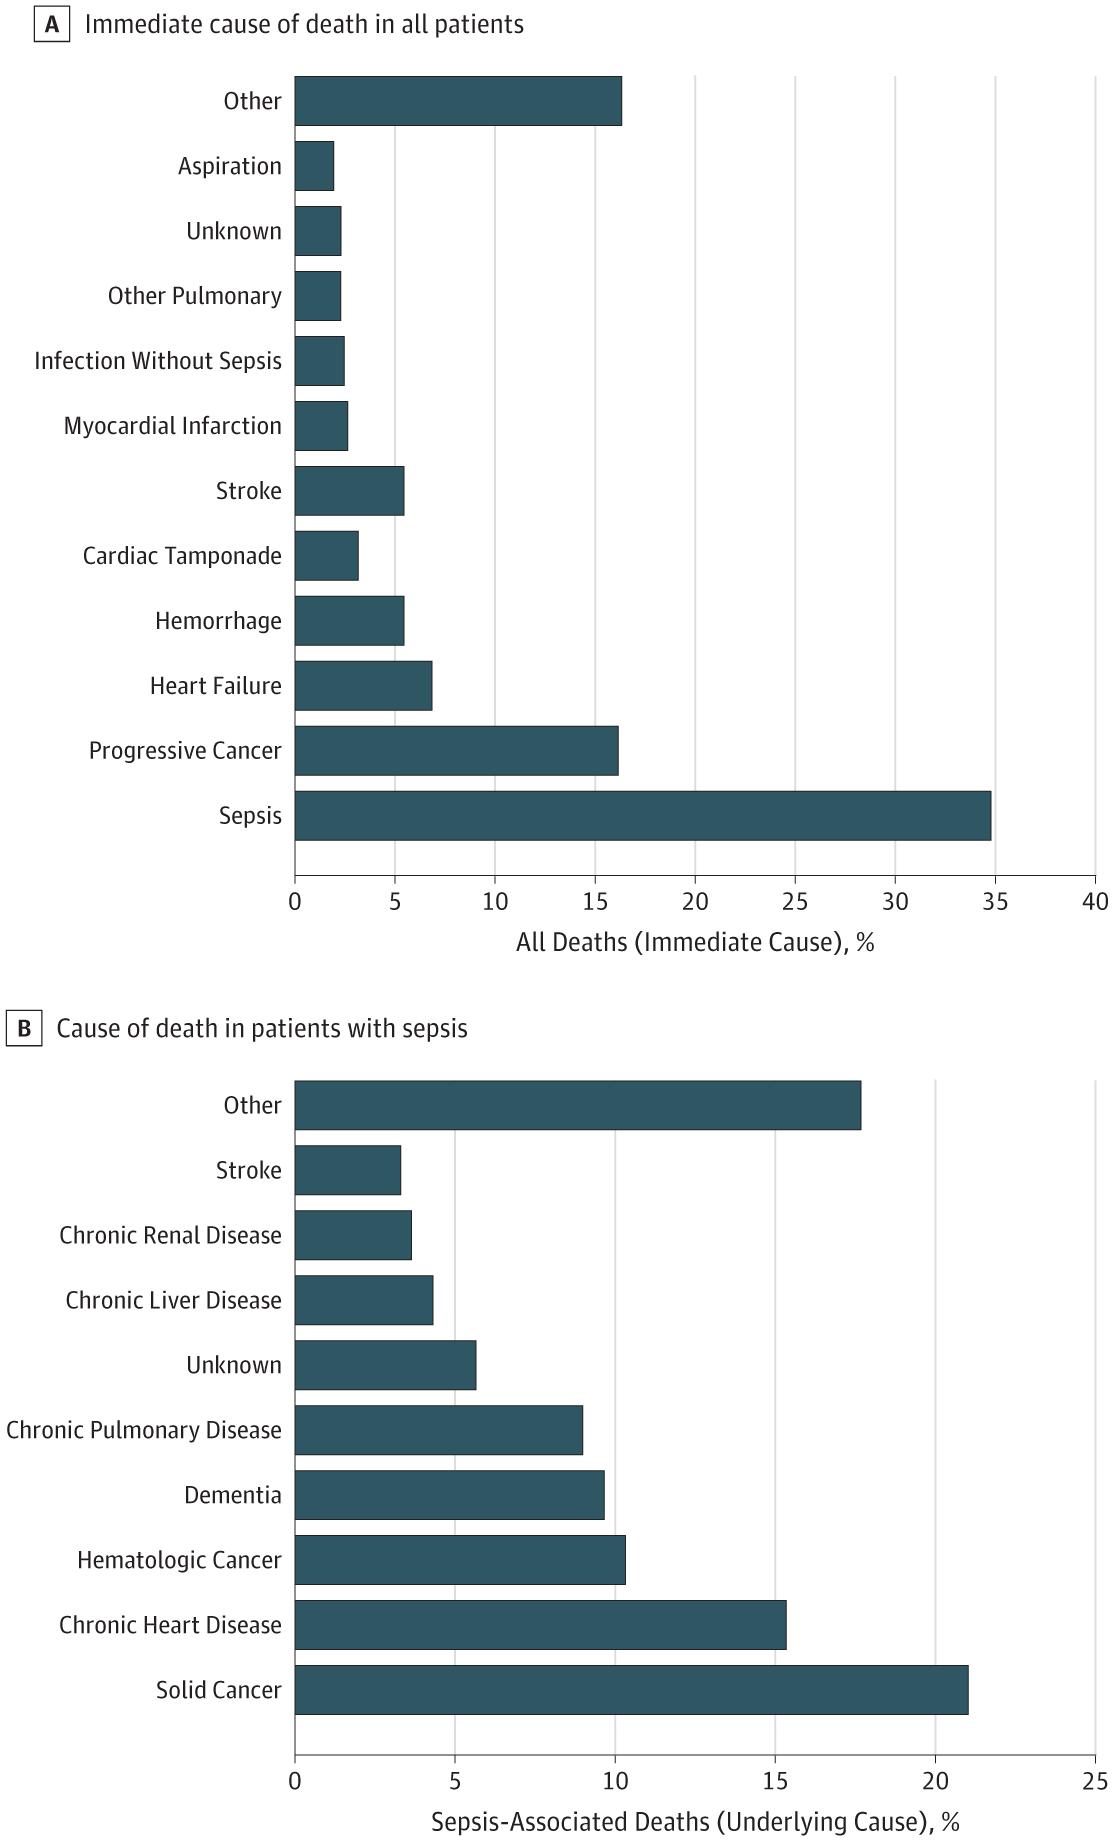 [JAMA Network Open发表论文]:美国急性病医院中全身性感染相关病死率,基础病因及可预防性